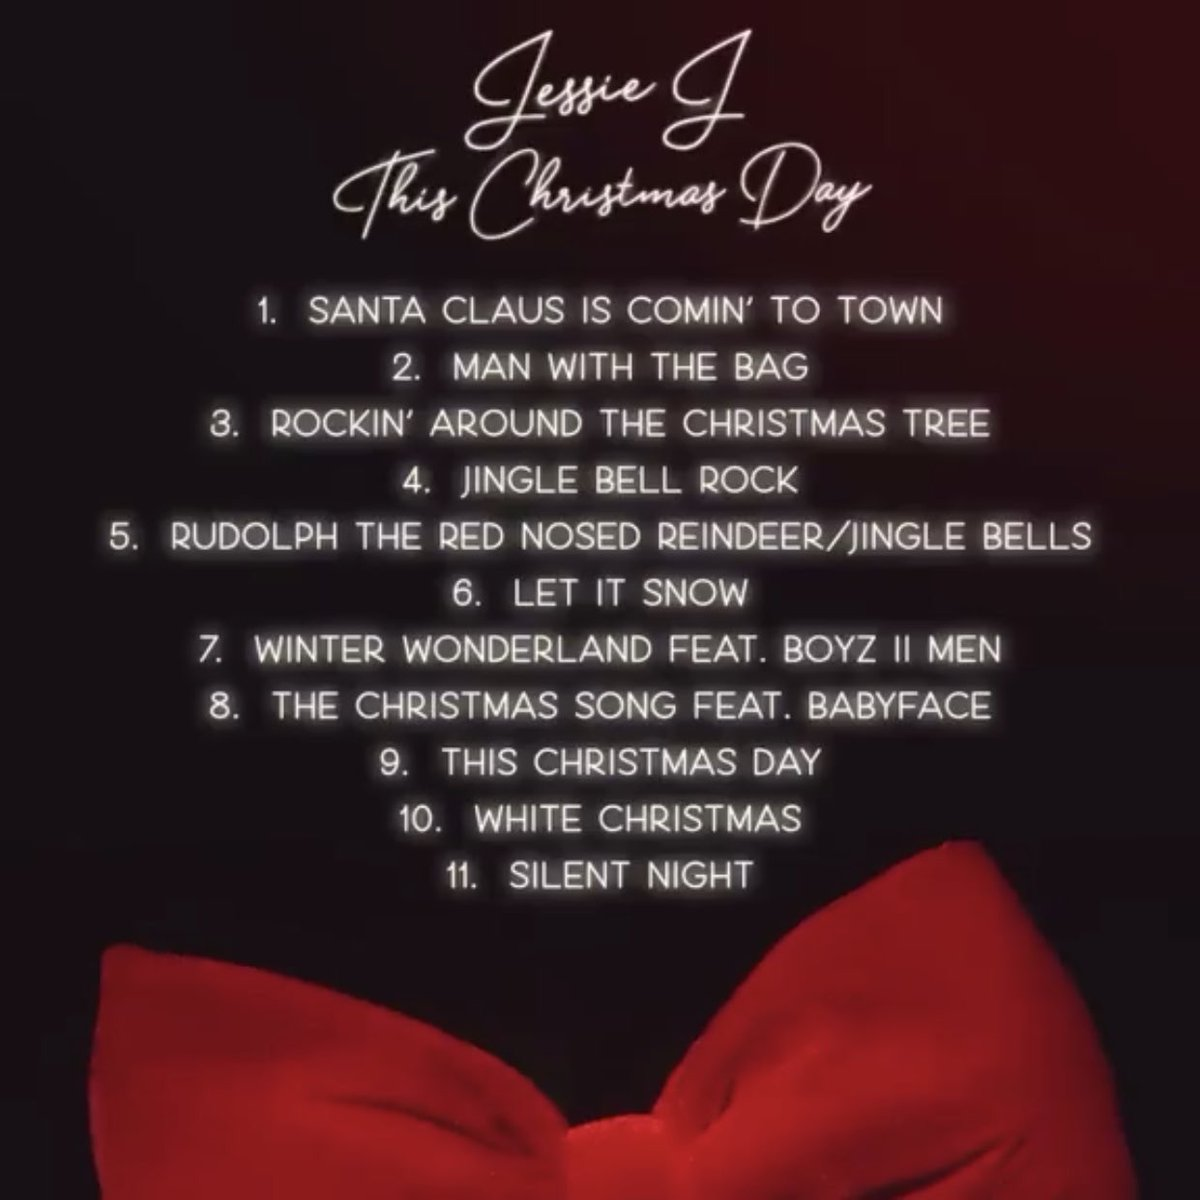 Jessie J This Christmas Day.Miss Jessie J 1 And Newest Online Resource For Jessie J